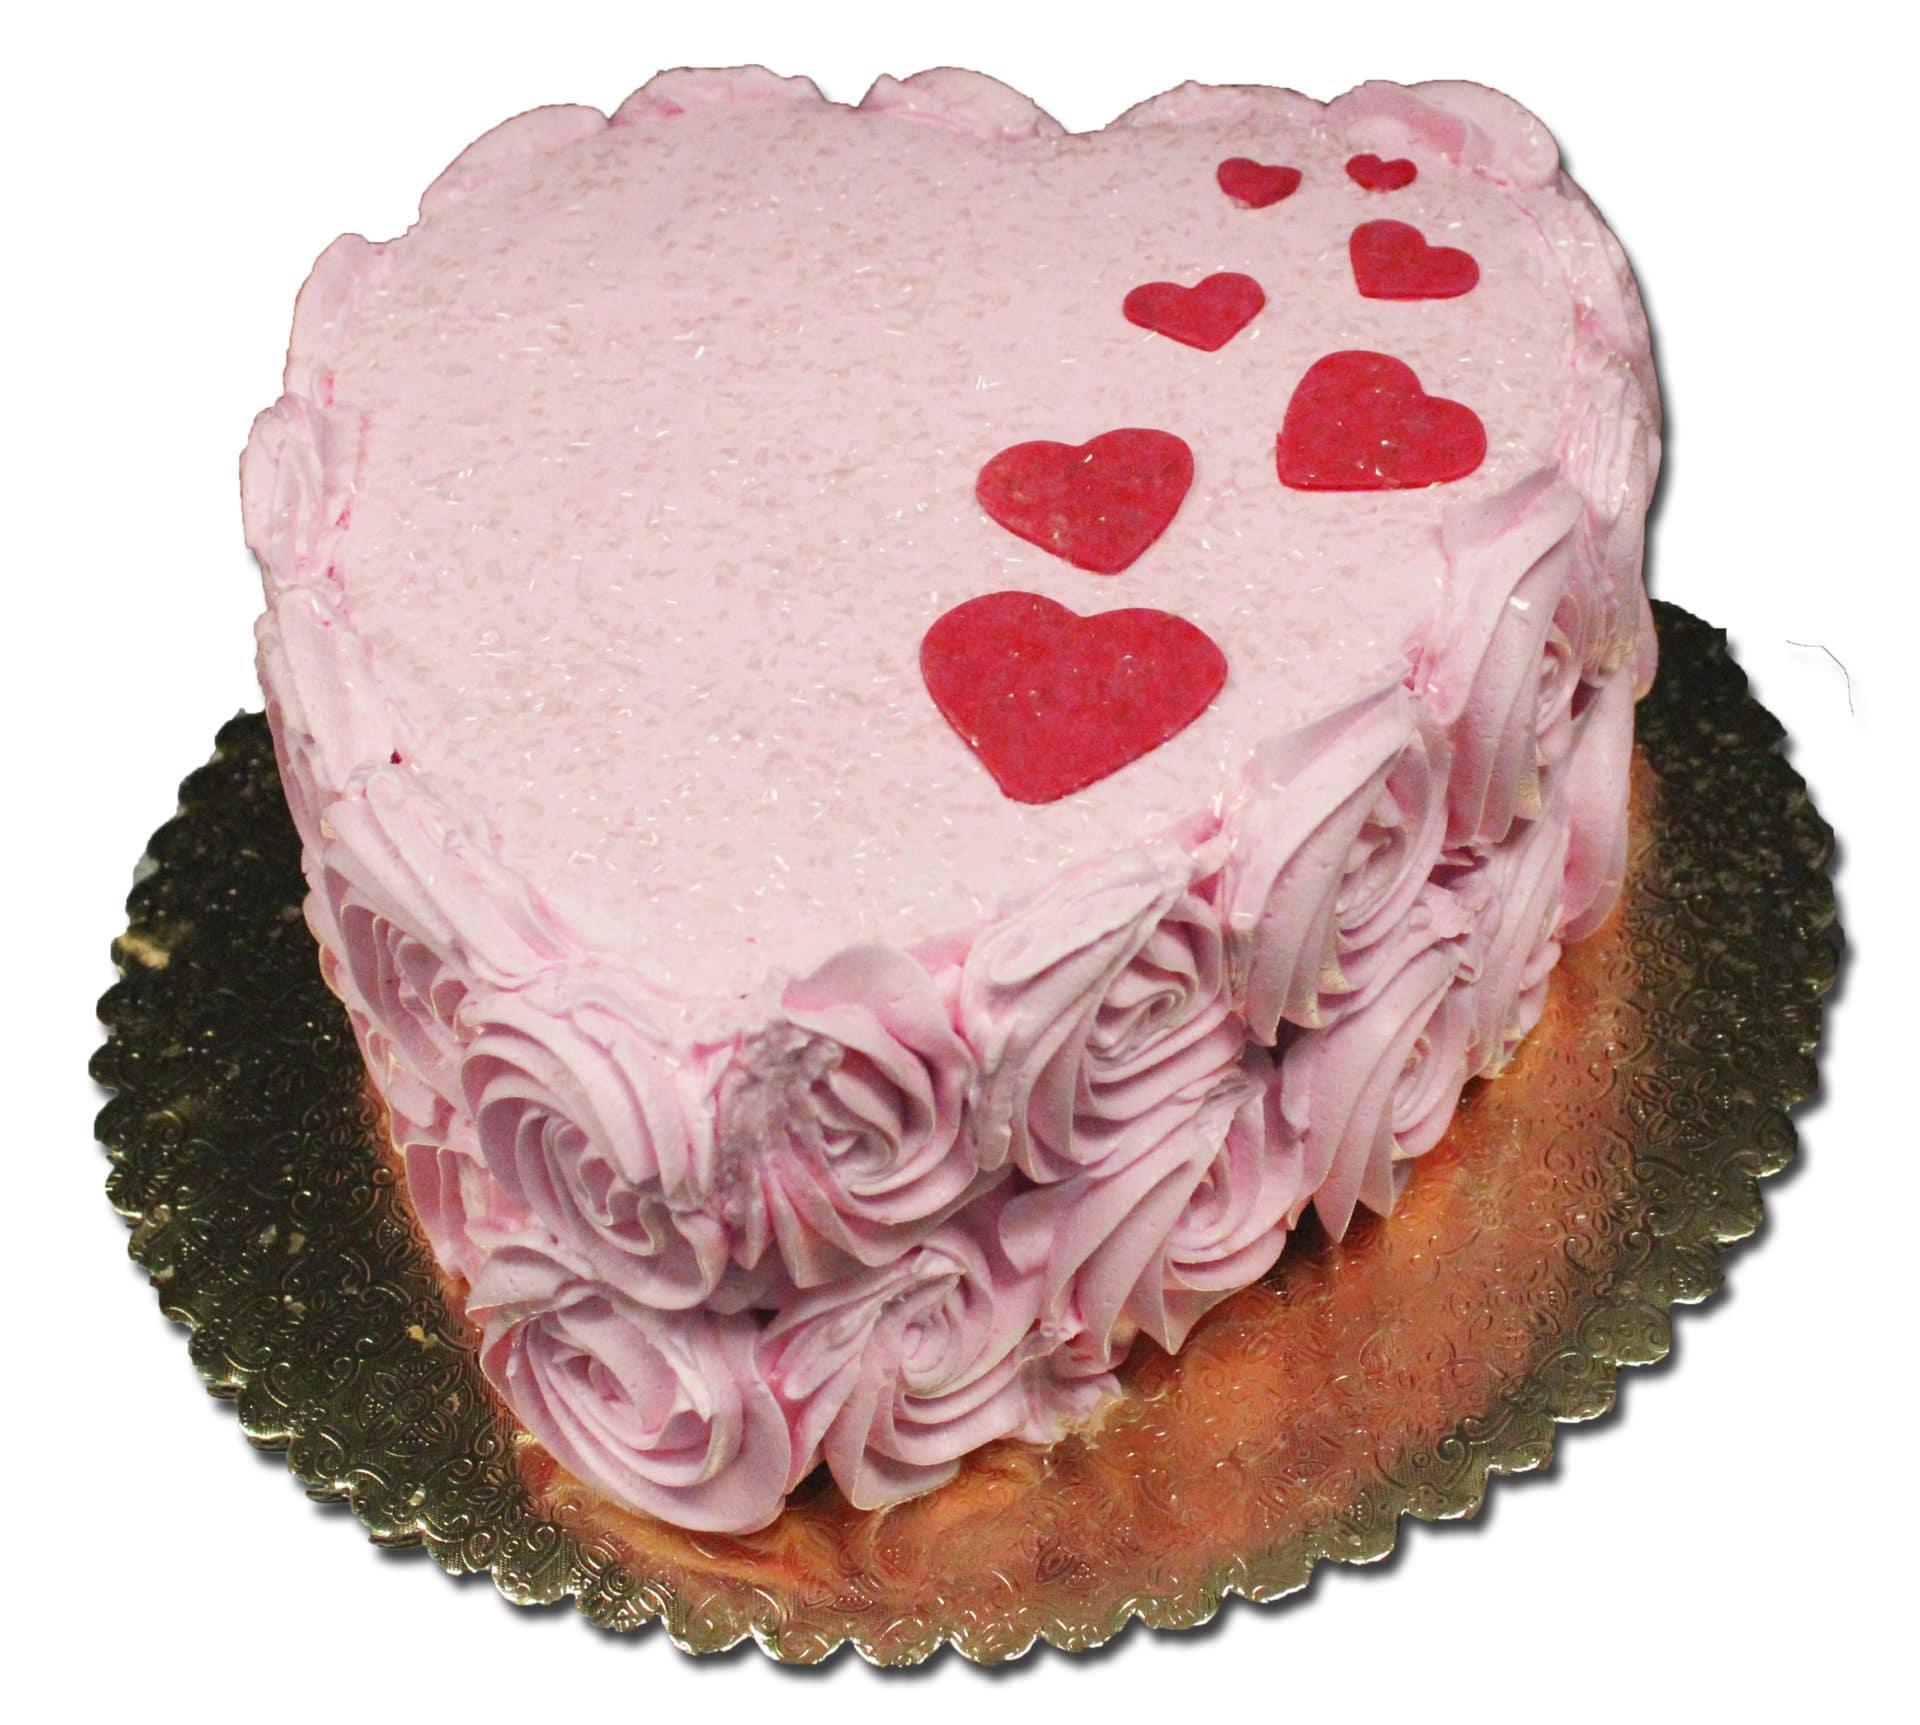 8 Rosette Heart Cake Single layer Aggies Bakery Cake Shop